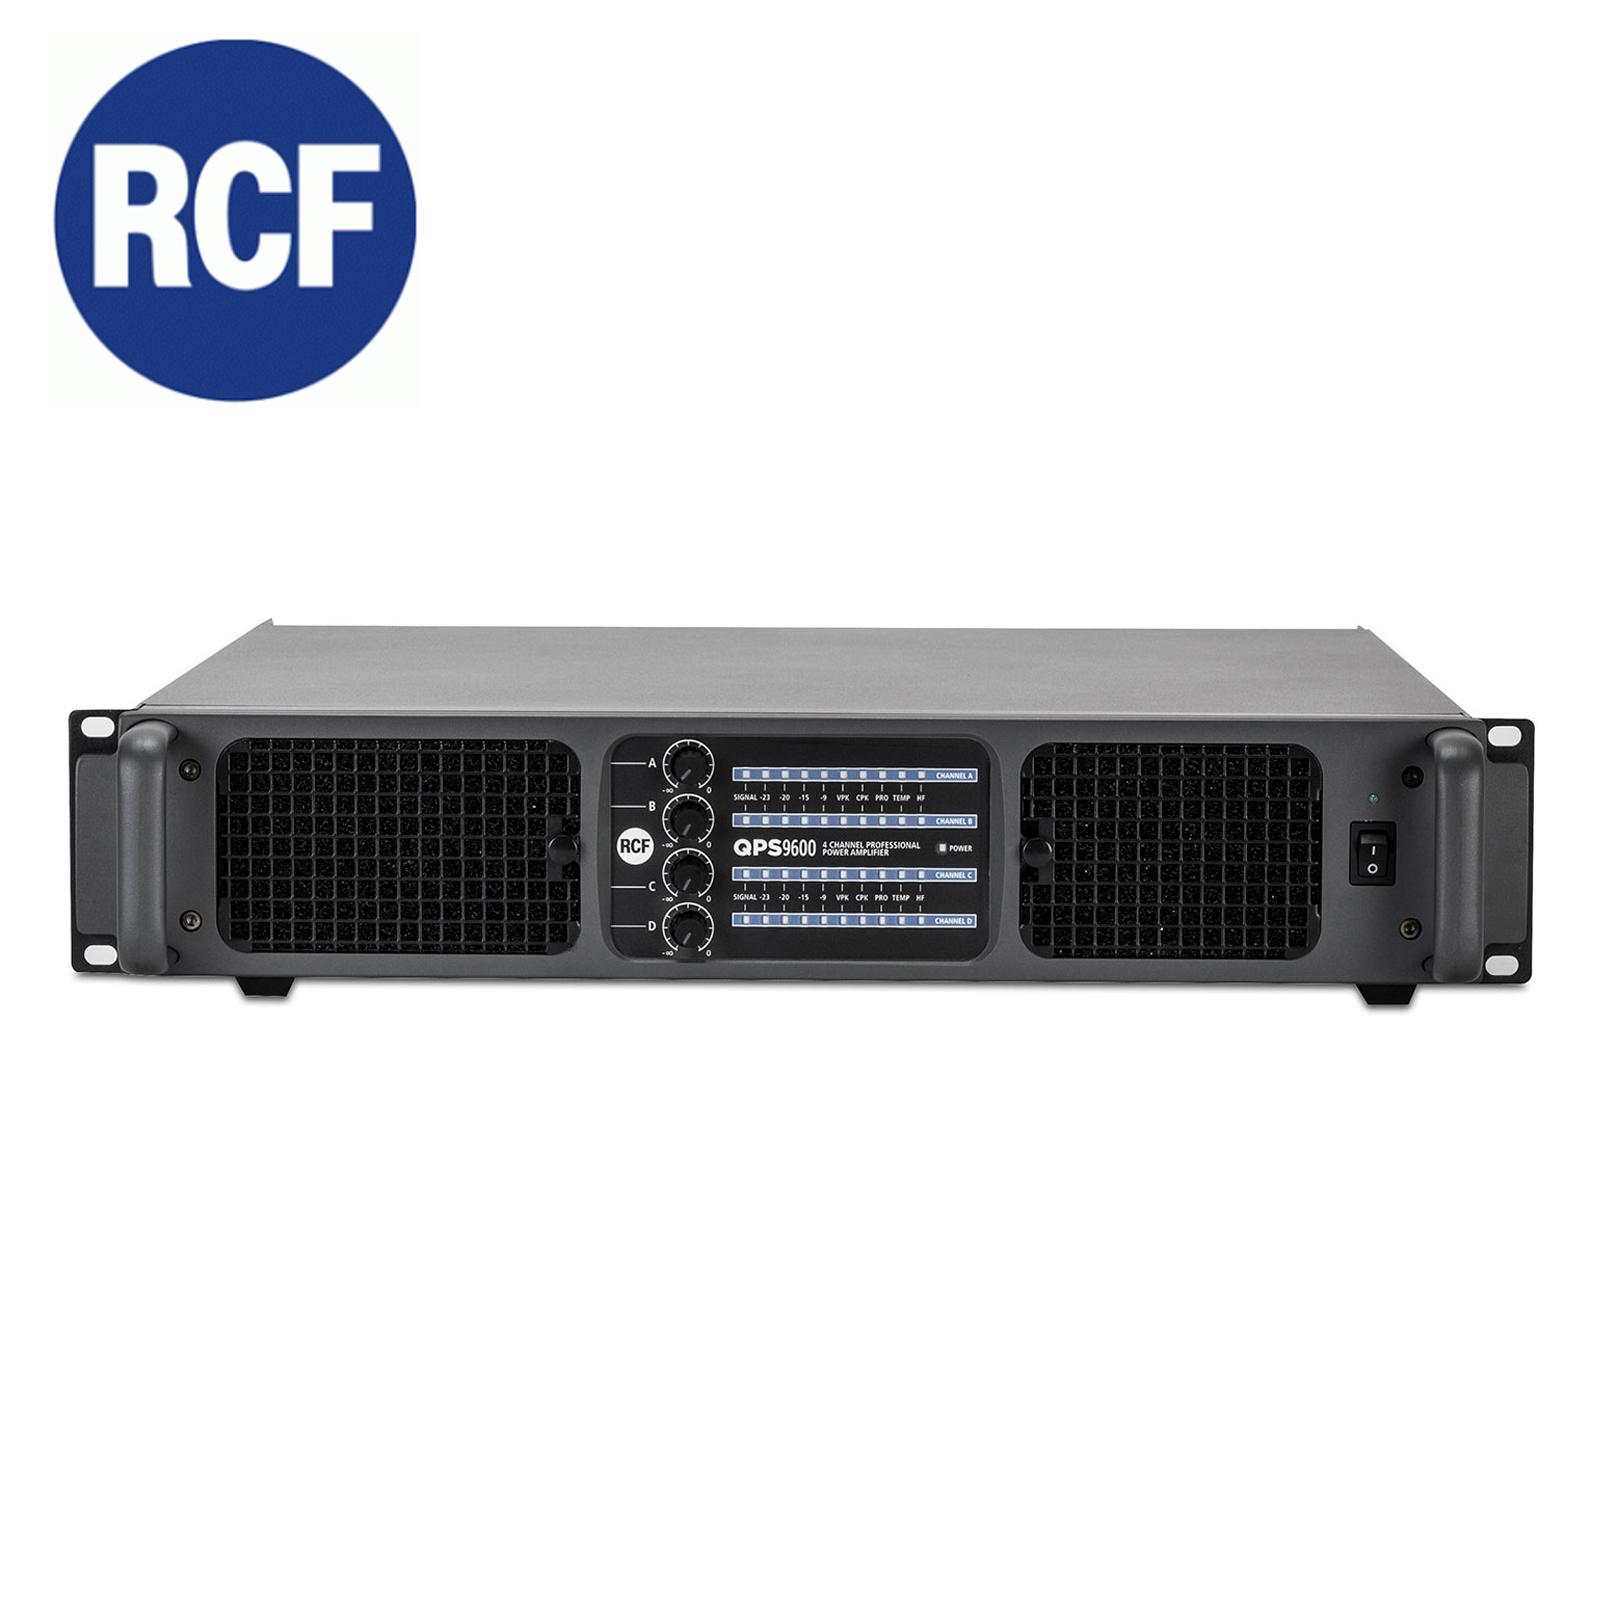 Rcf Qps 9600 High Power Amplifier 2x2400 W Rms 2 Ohm Live Market Audio Lighting